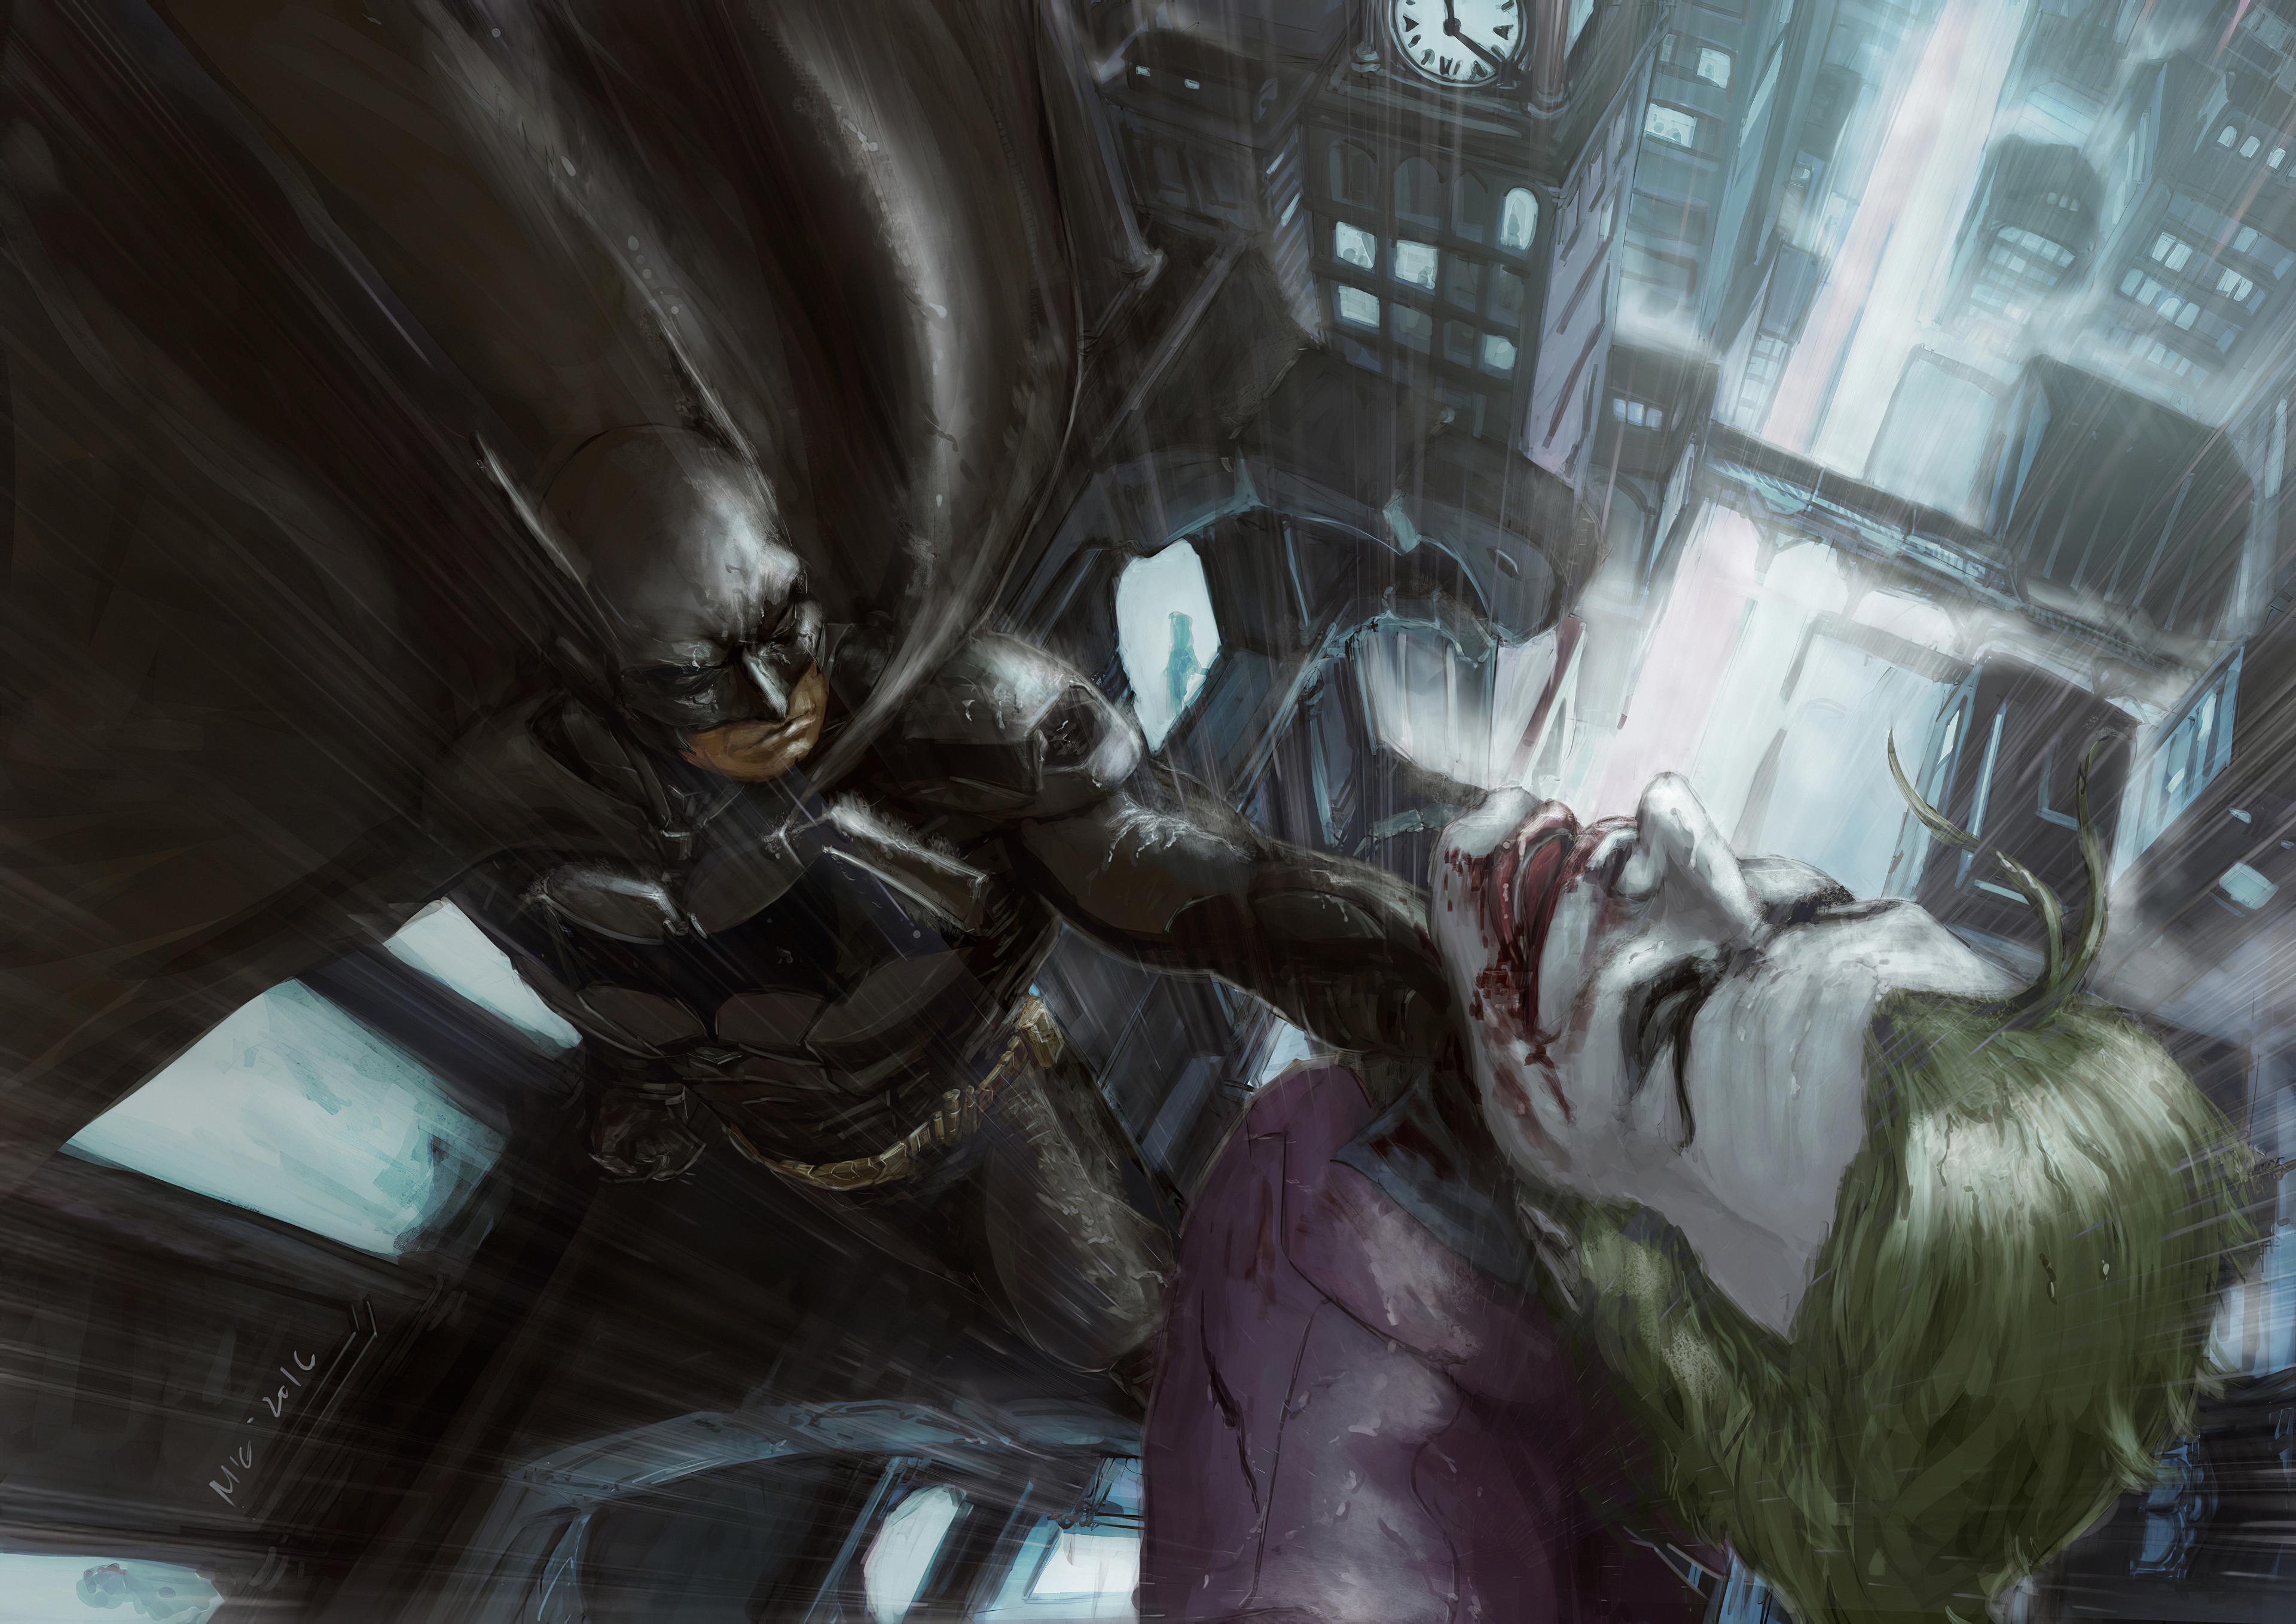 batman vs joker art 1580587431 - Batman vs Joker Art - Batman vs Joker wallpapers 4k, Batman vs Joker Art wallpapers, Batman vs Joker Art 4k wallpapers